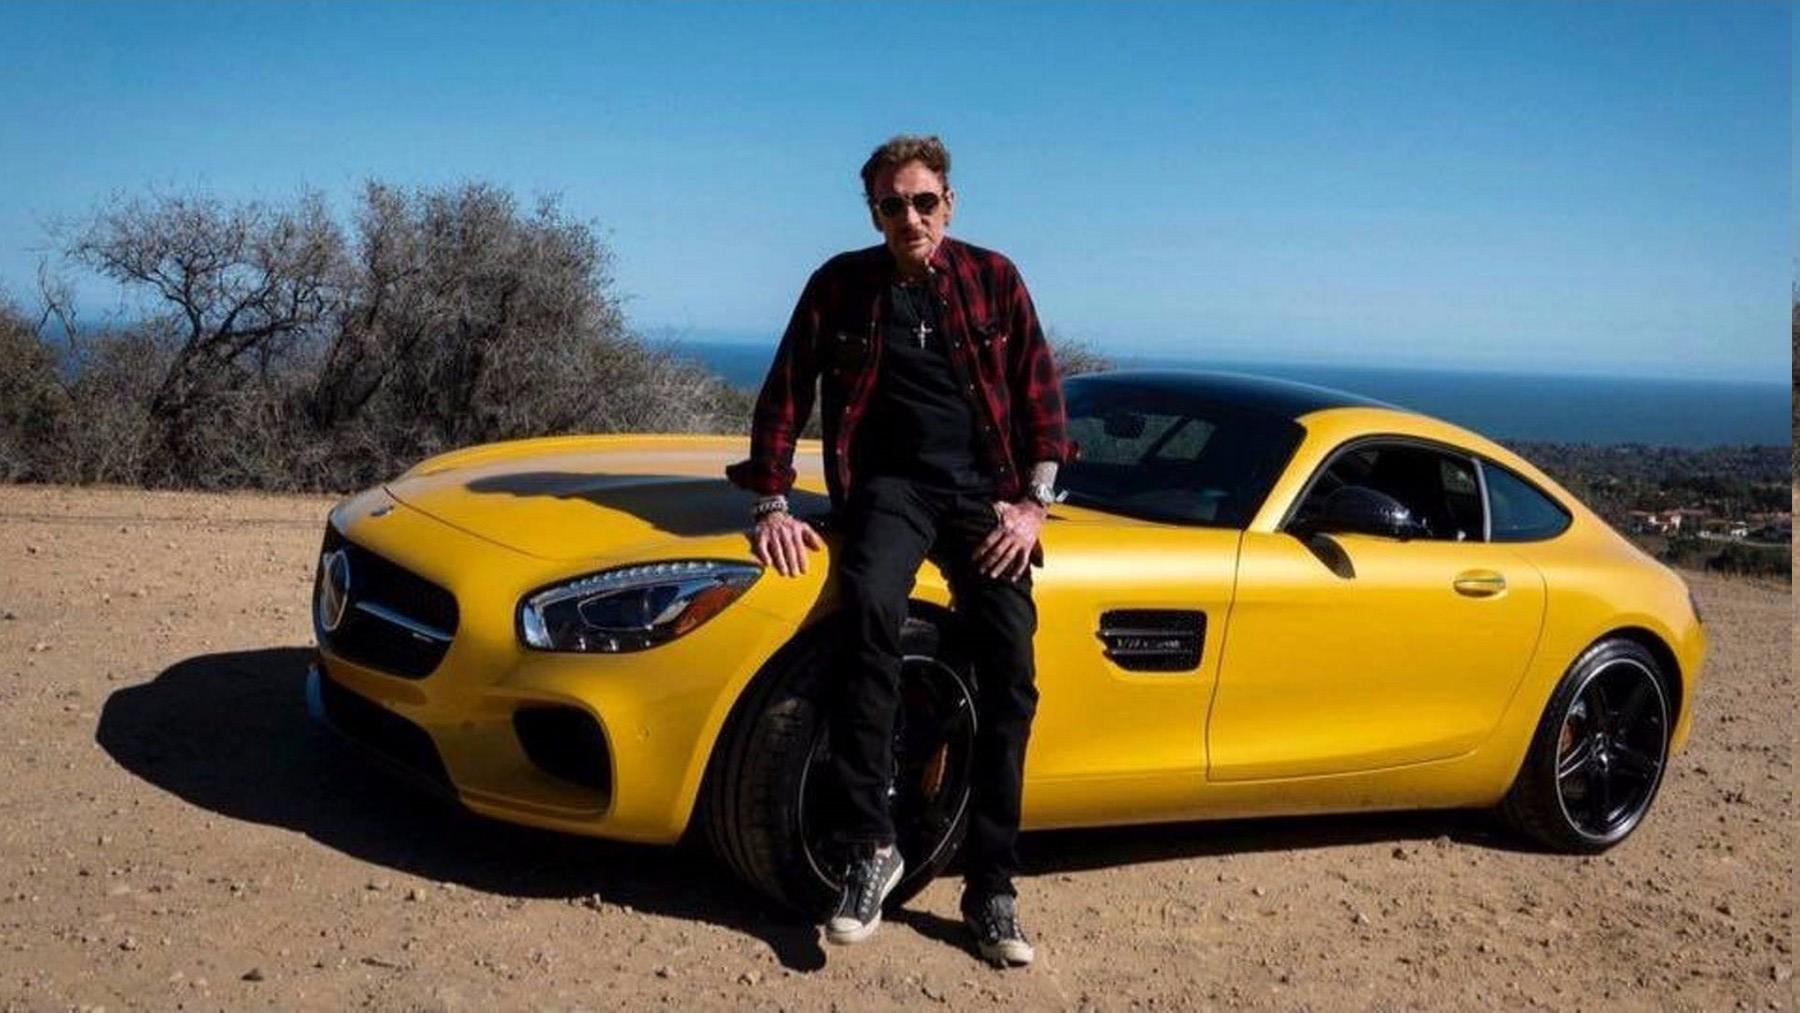 MERCEDES-AMG GT DE JOHNNY HALLYDAY ( 2016 ) Merced10